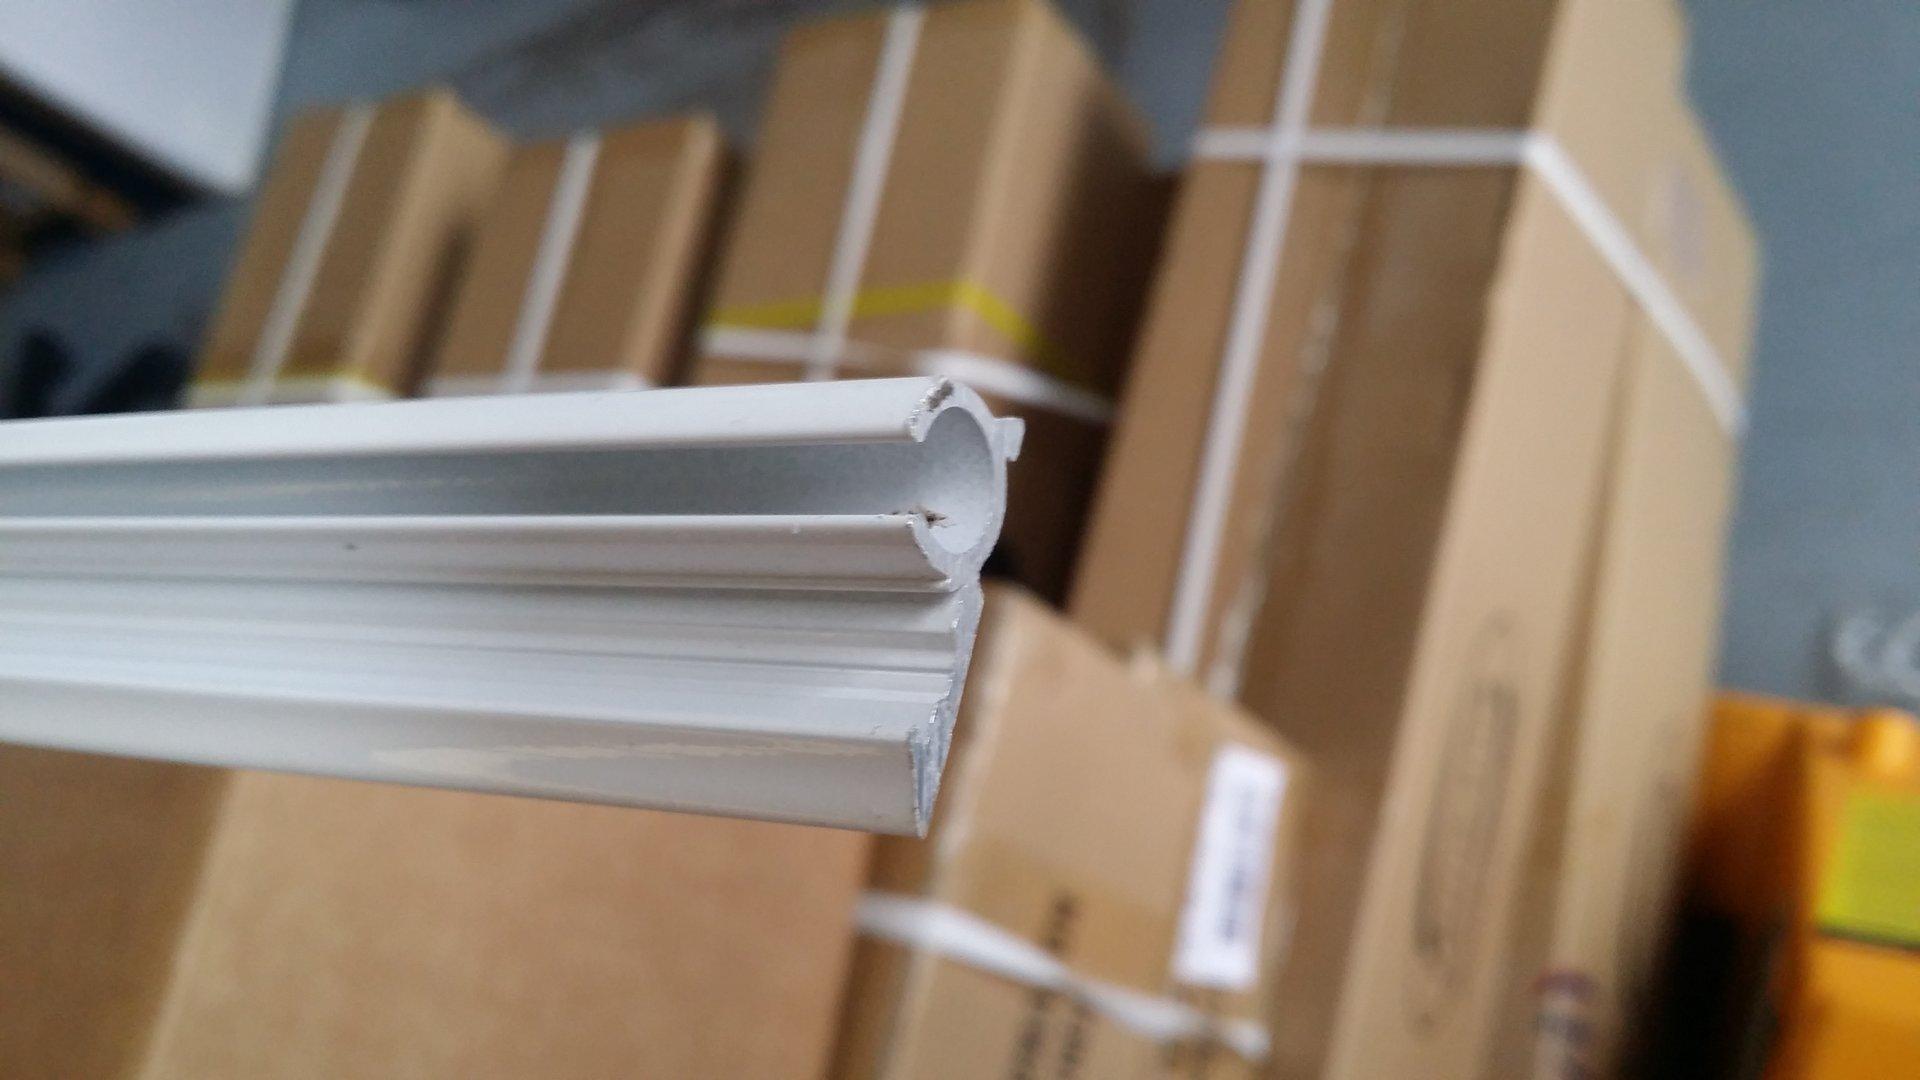 Guia aluminio blanco perfil para avance toldilla barra 3 for Materiales para toldos de aluminio